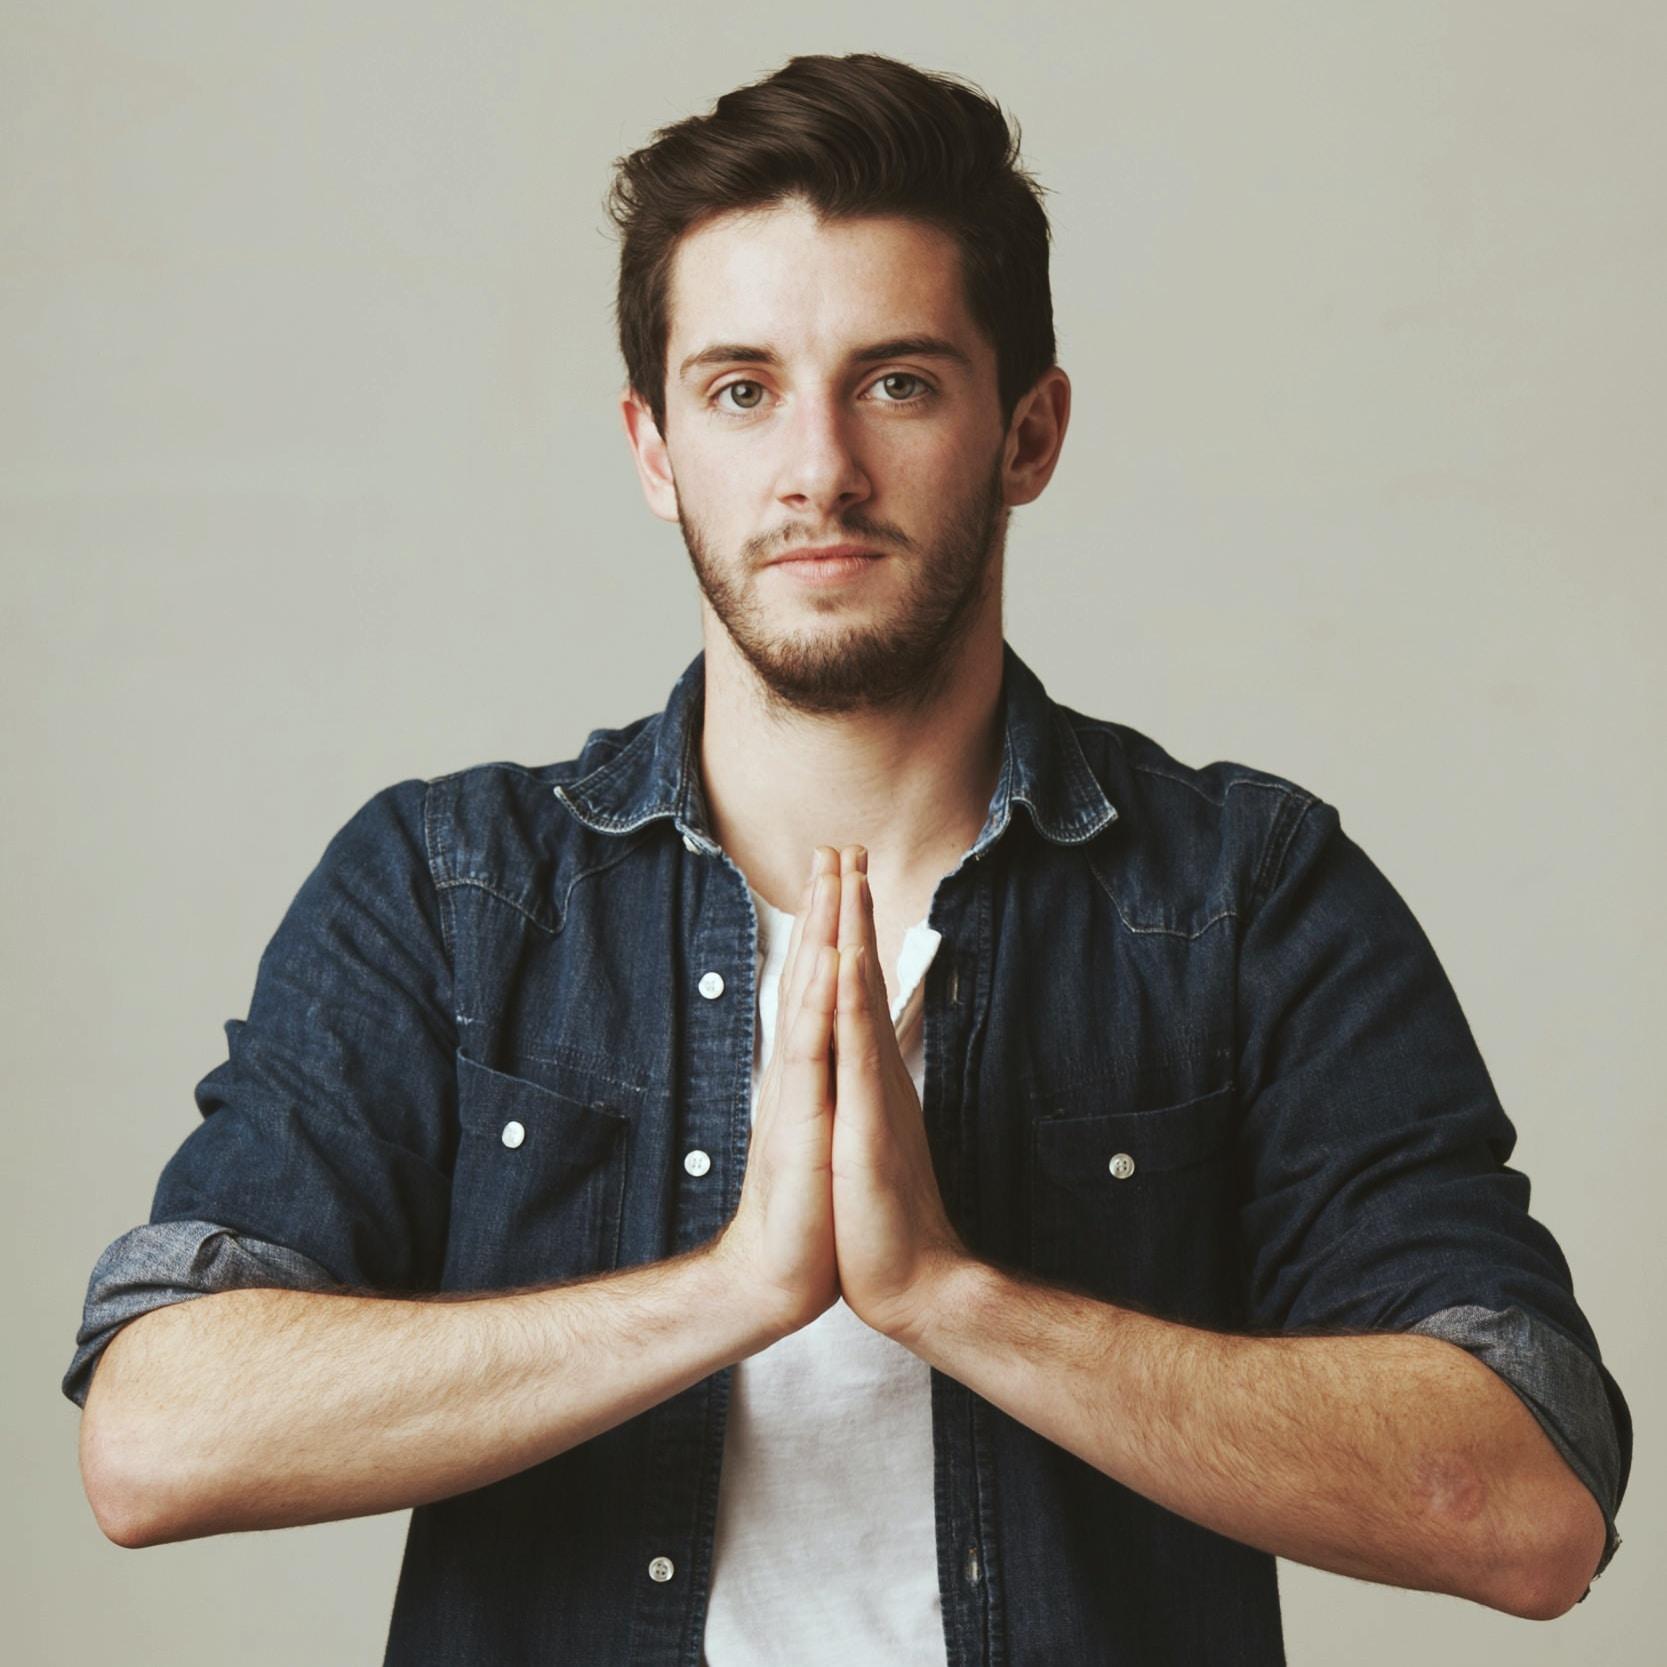 Go to Josh Reeder-Esparza's profile